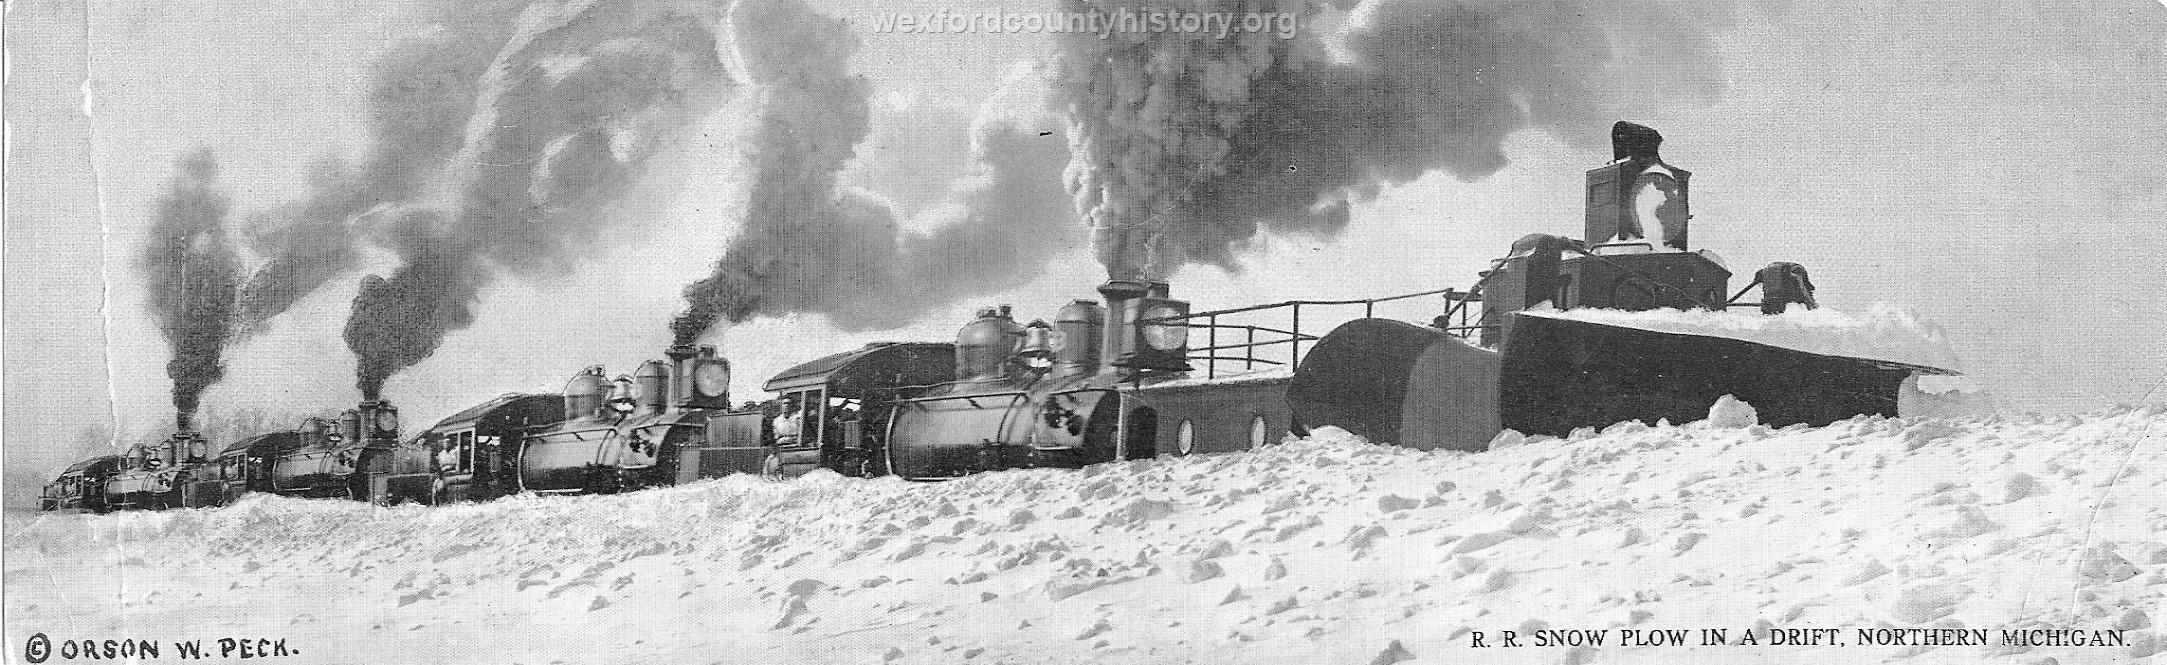 Cadillac-Railroad-Removing-snow-from-railroad-tracks